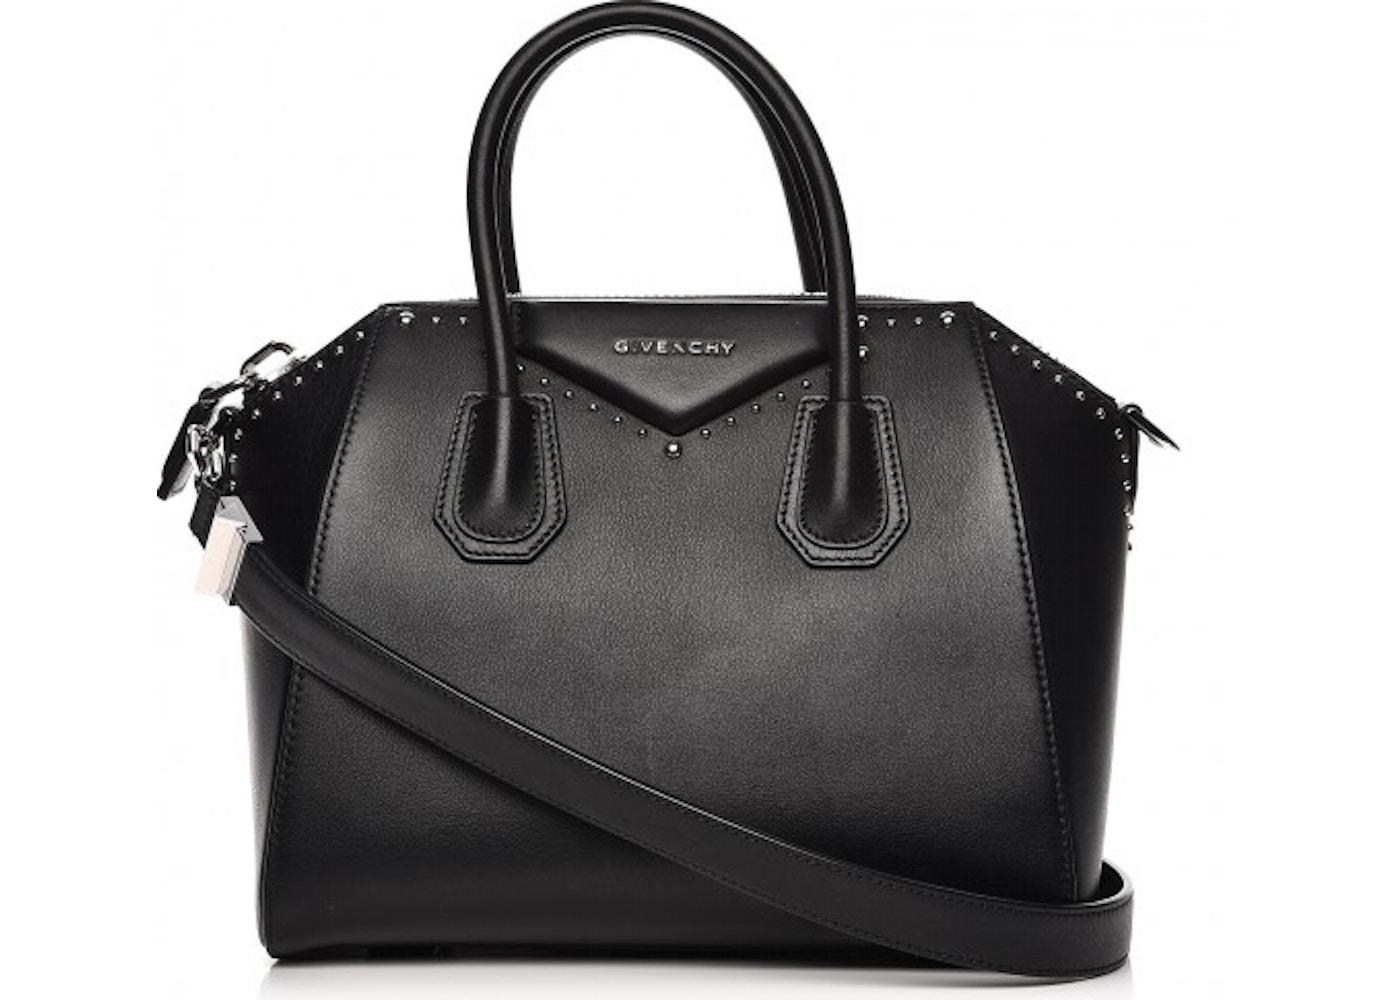 8021a815db46 Givenchy Antigona Tote Studded Small Black. Studded Small Black